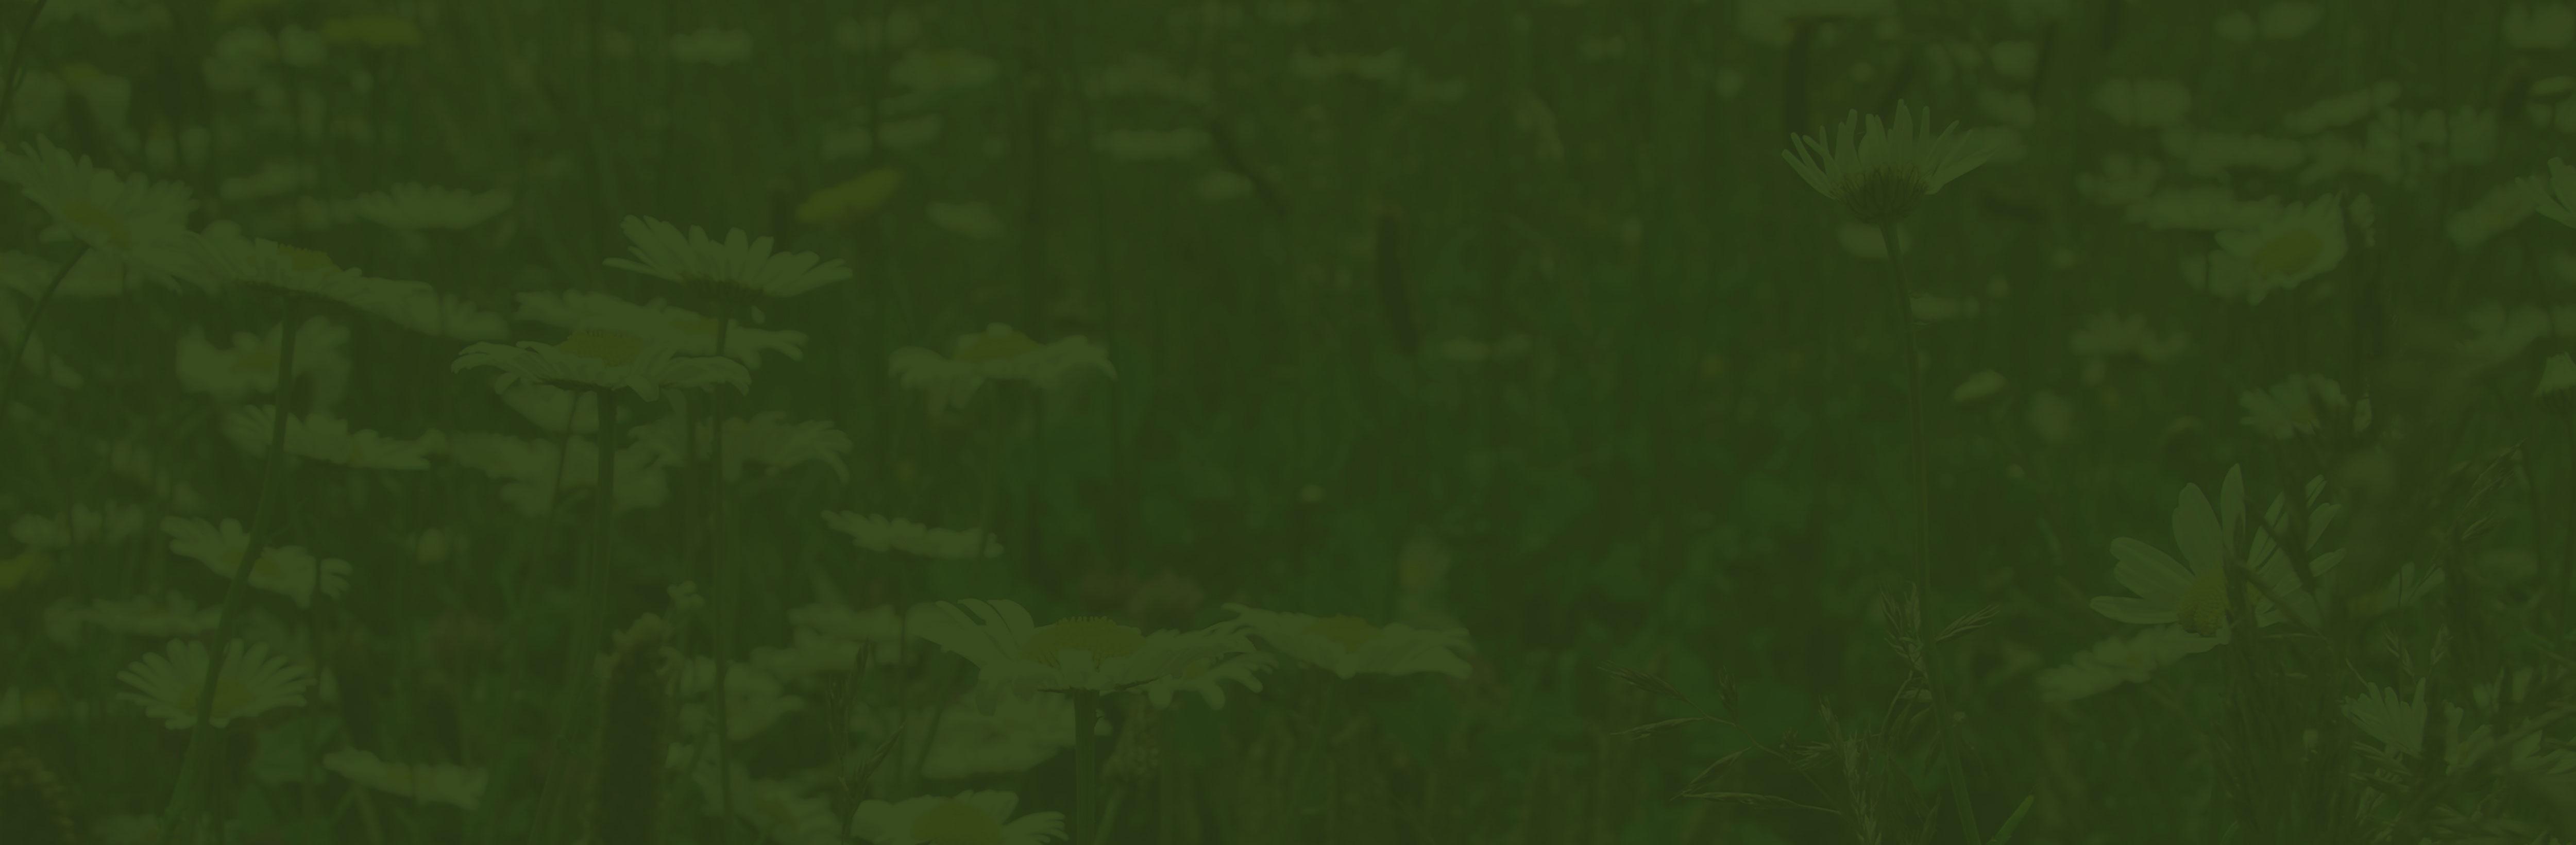 Vegetation Blankets | Wildflower Blankets | Roof substrates